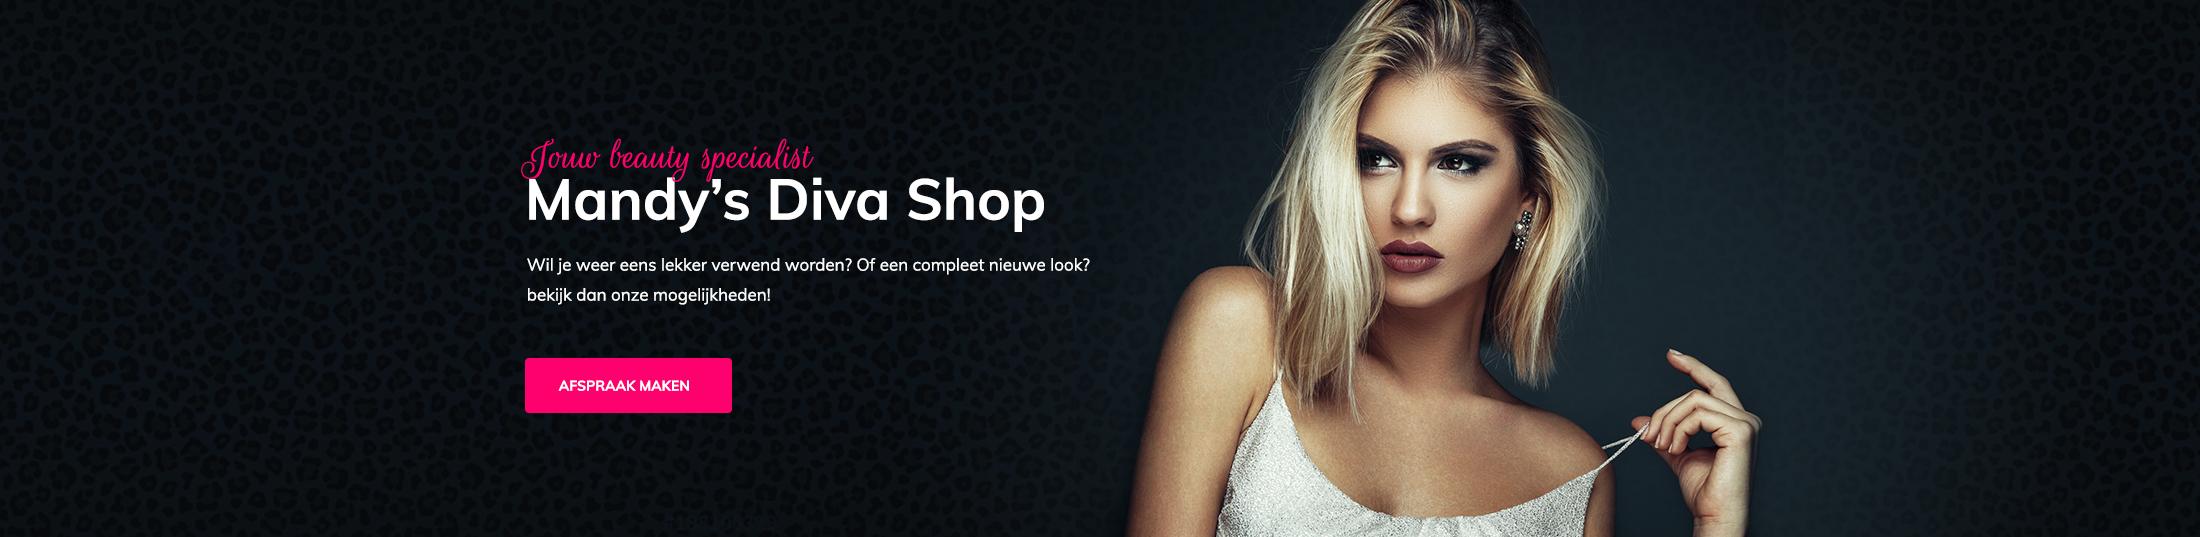 Mandy's Diva shop